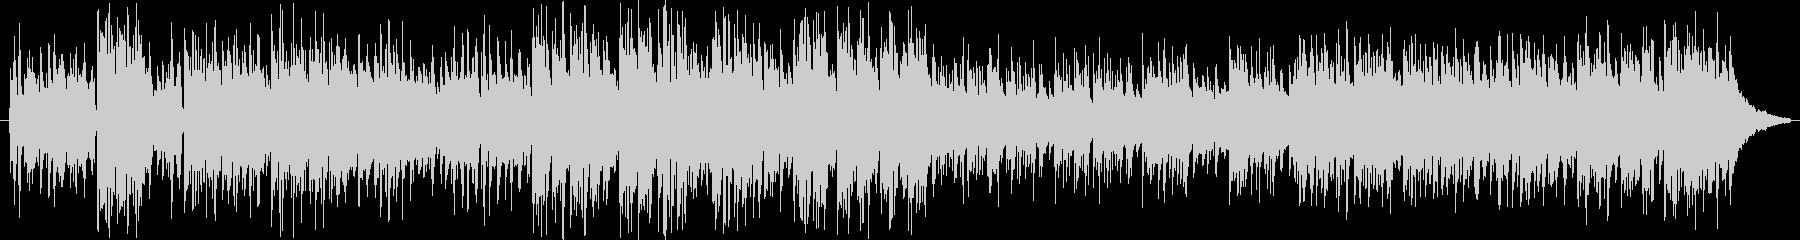 Gガーシュインの名曲を軽快なルンバでの未再生の波形